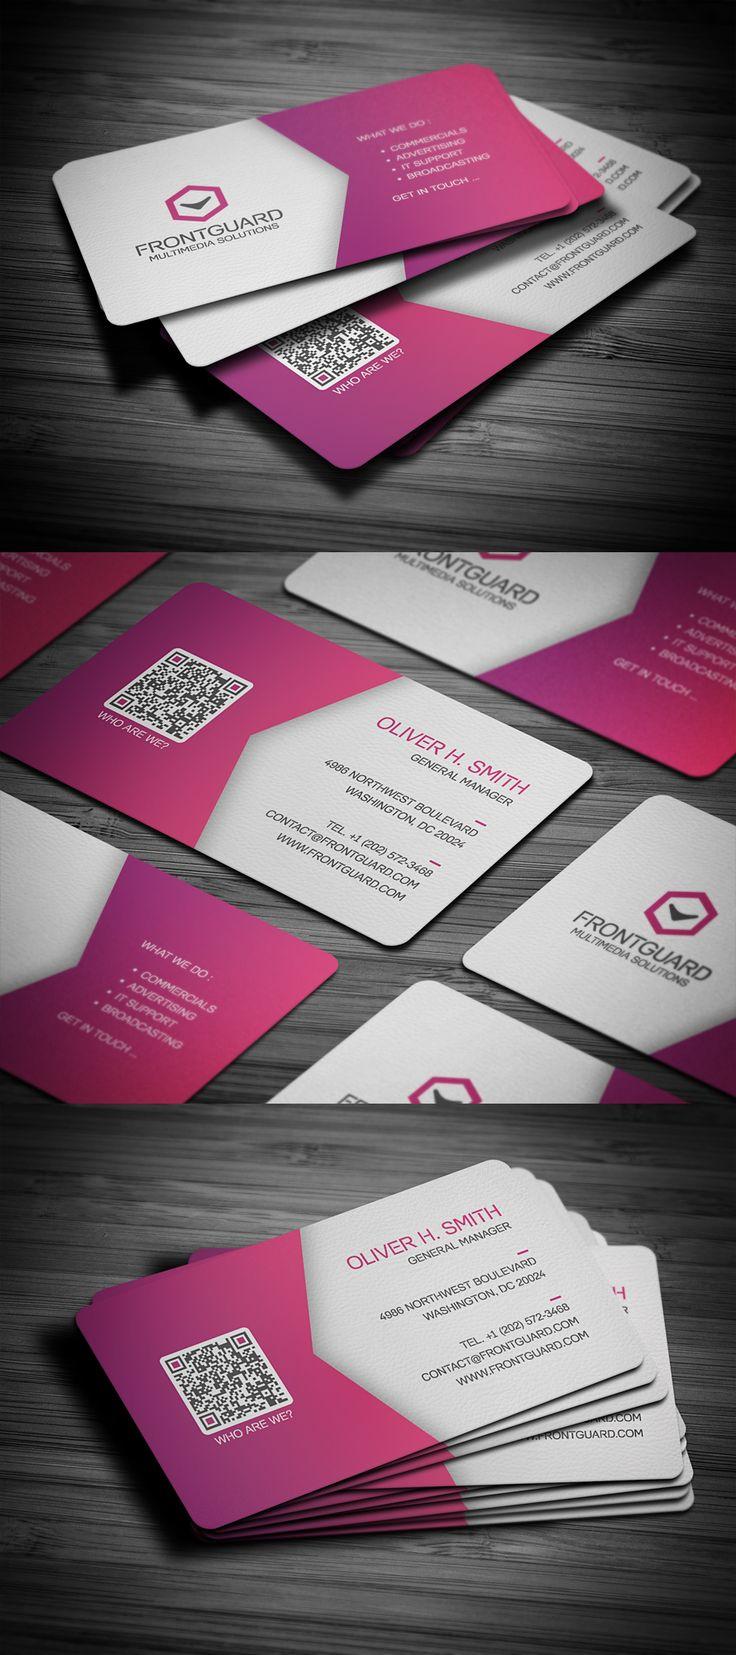 133 best business card design images on pinterest trends 133 best business card design images on pinterest trends business cards and community manager magicingreecefo Images